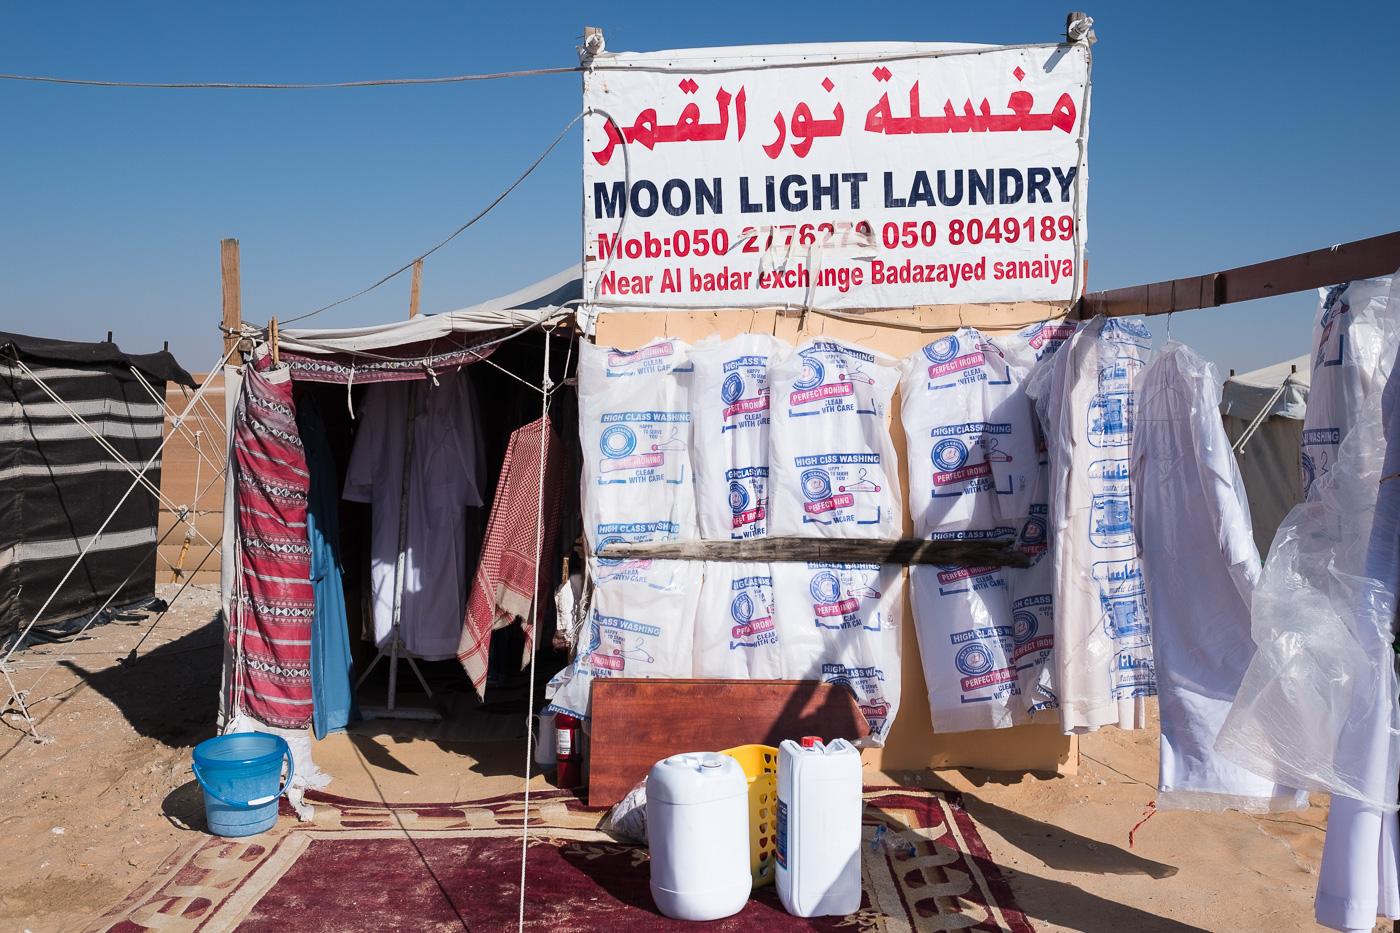 The Camel Festival shops #4